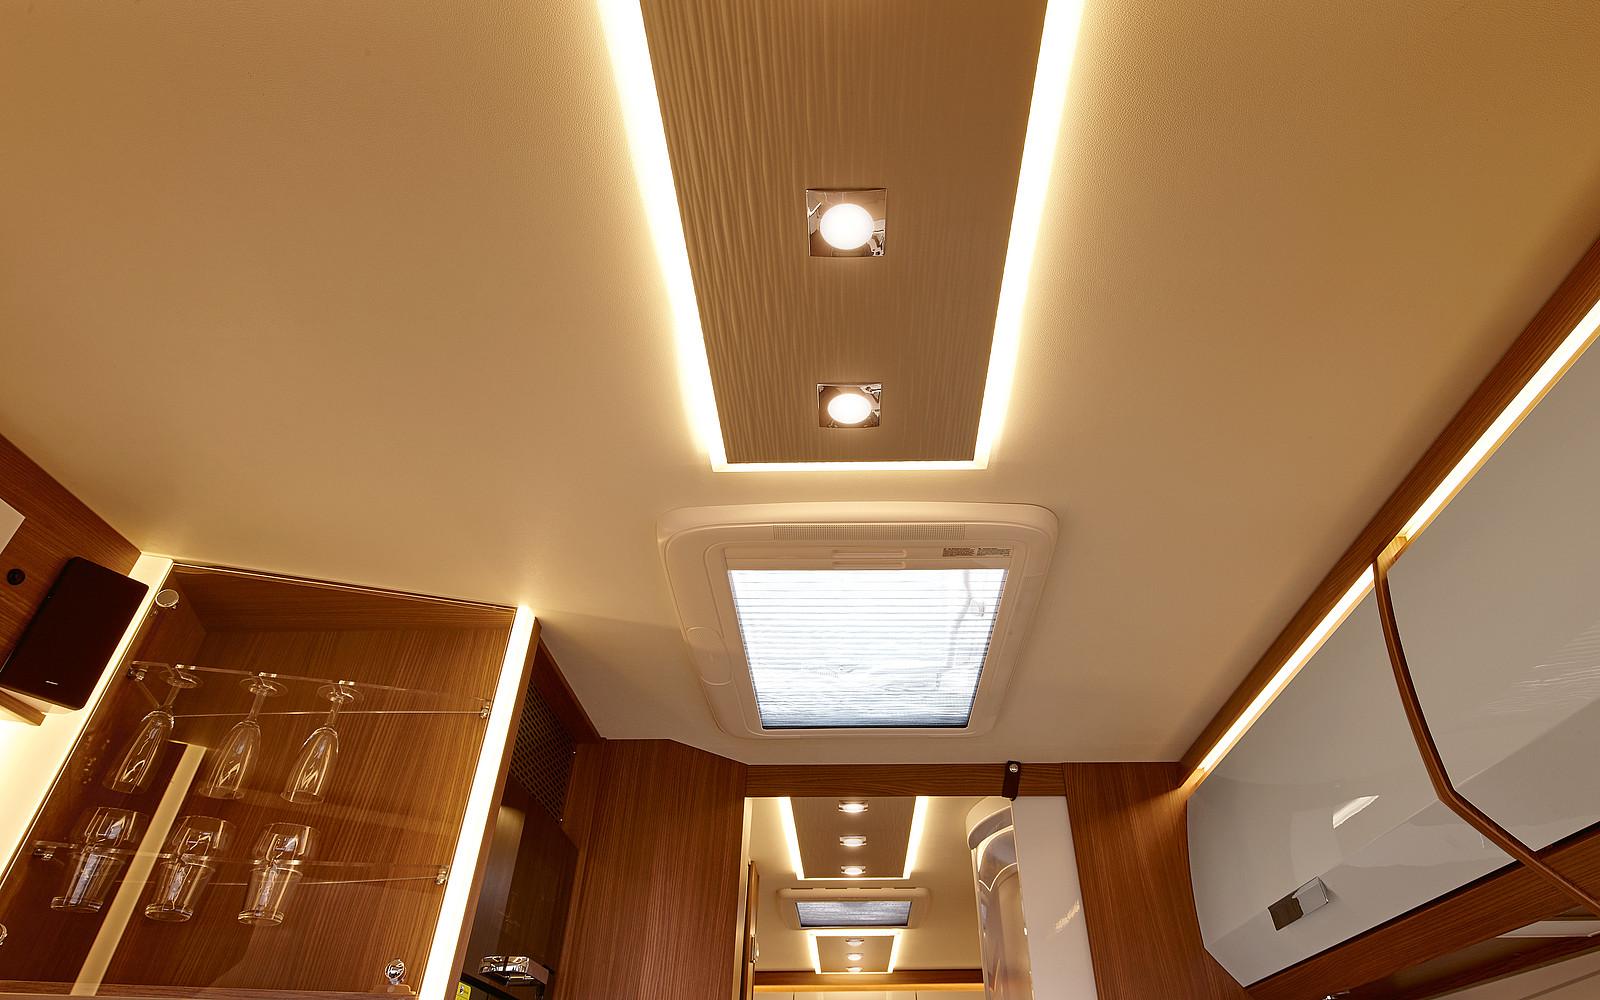 2020 Burstner Elegance Motorhome - Interior Photo - Skylight